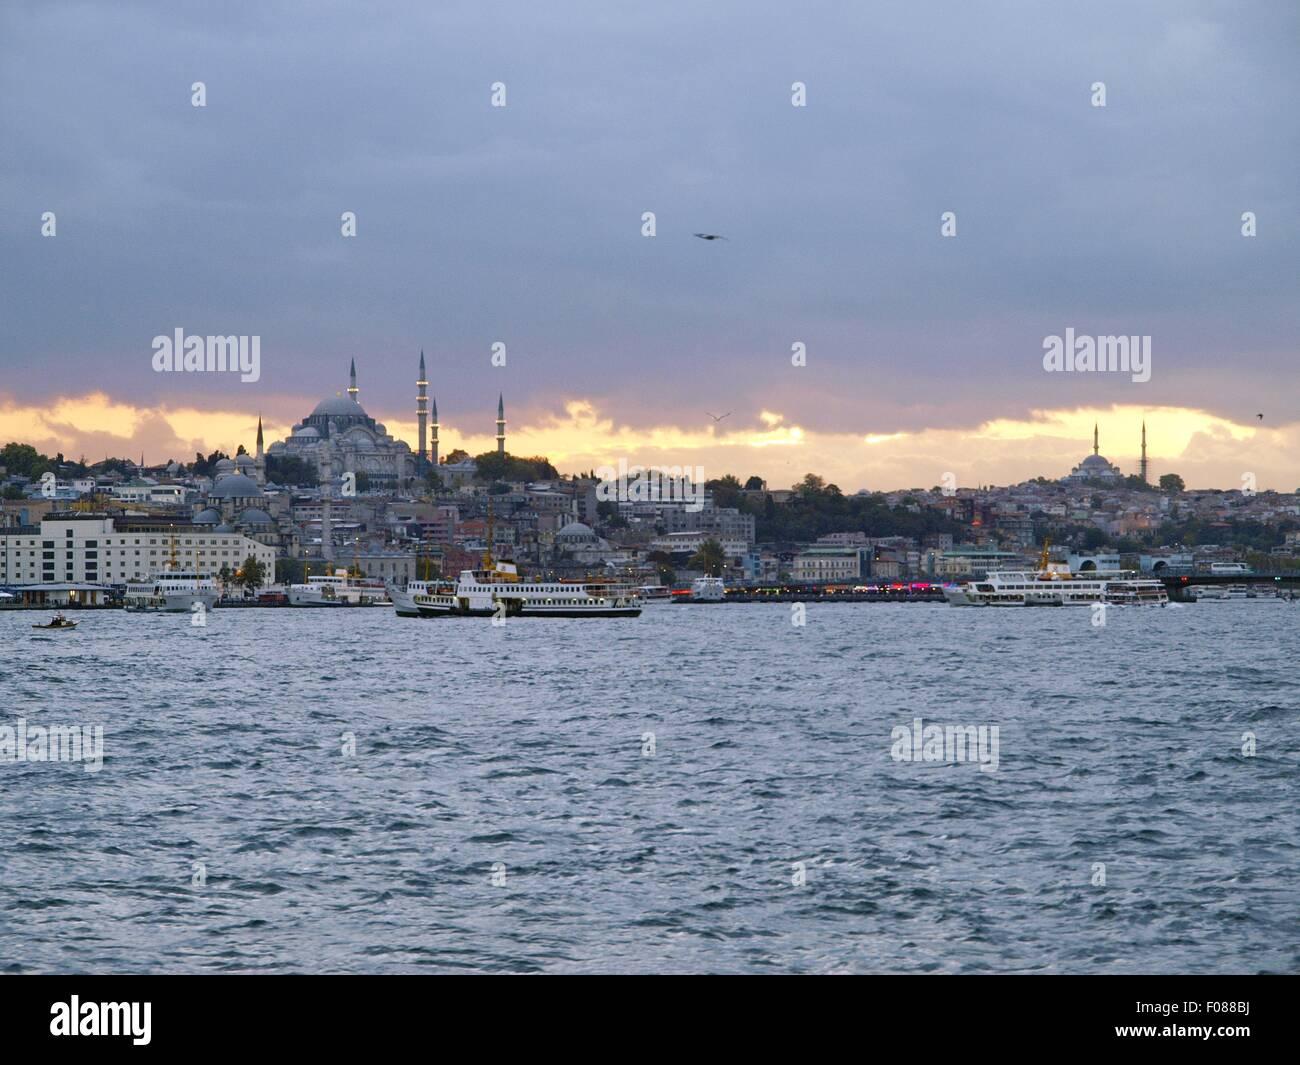 View of cityscape of city on coast of Bosphorus and ferryboats at dusk, Istanbul, Turkey - Stock Image